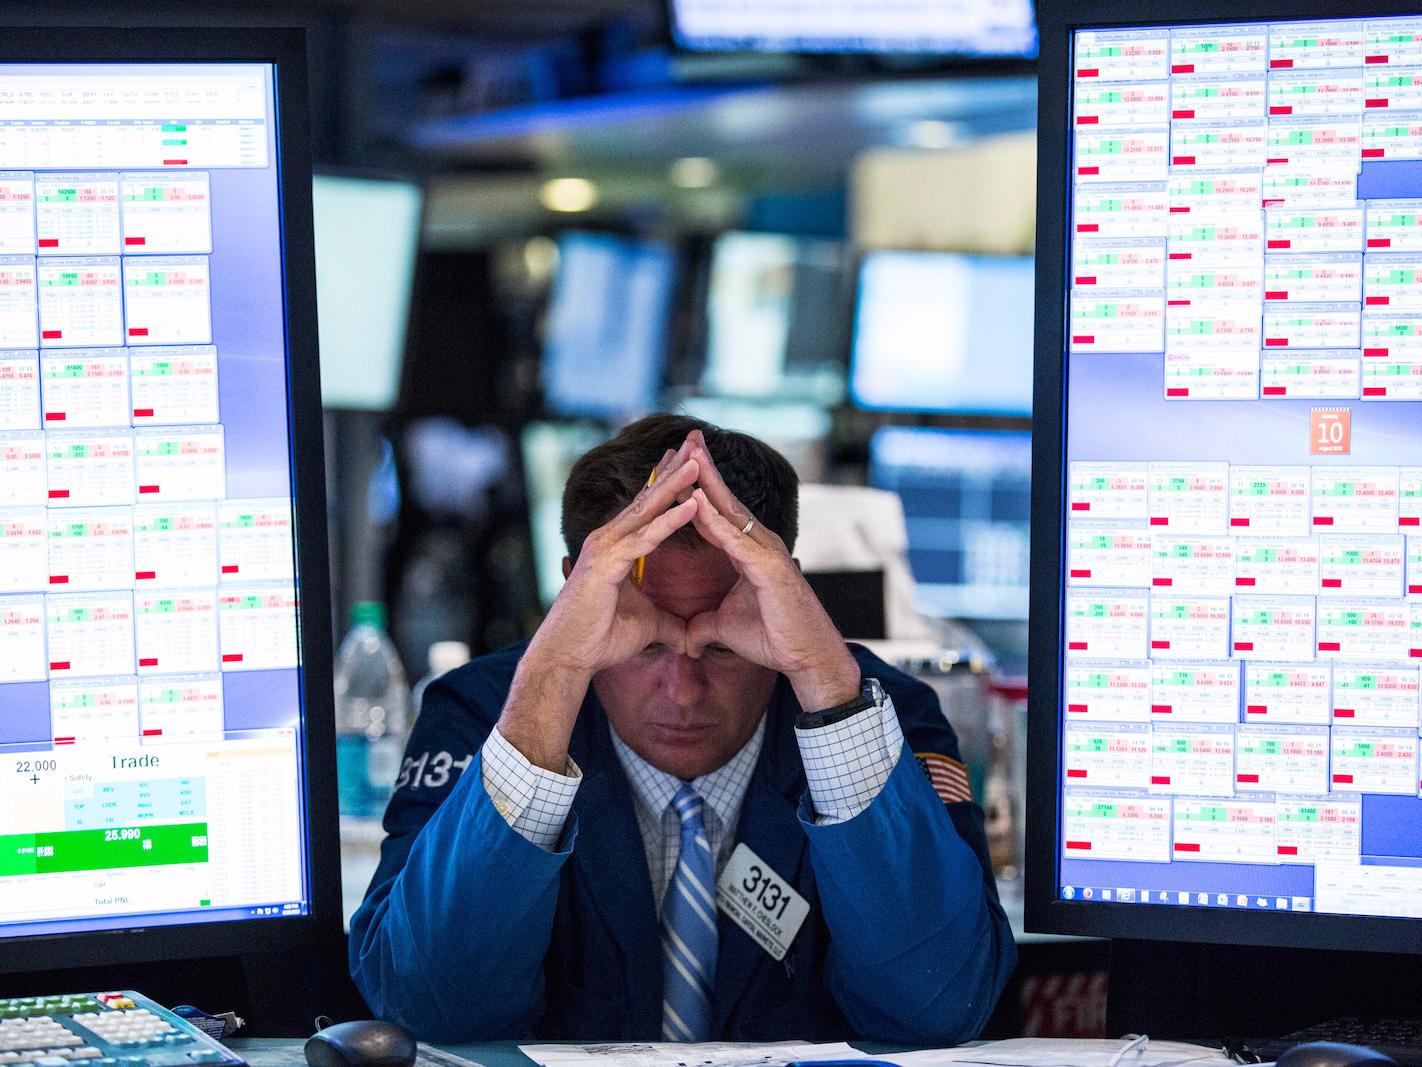 Traders were blindsided by Celgene's massive earnings flop (CELG)